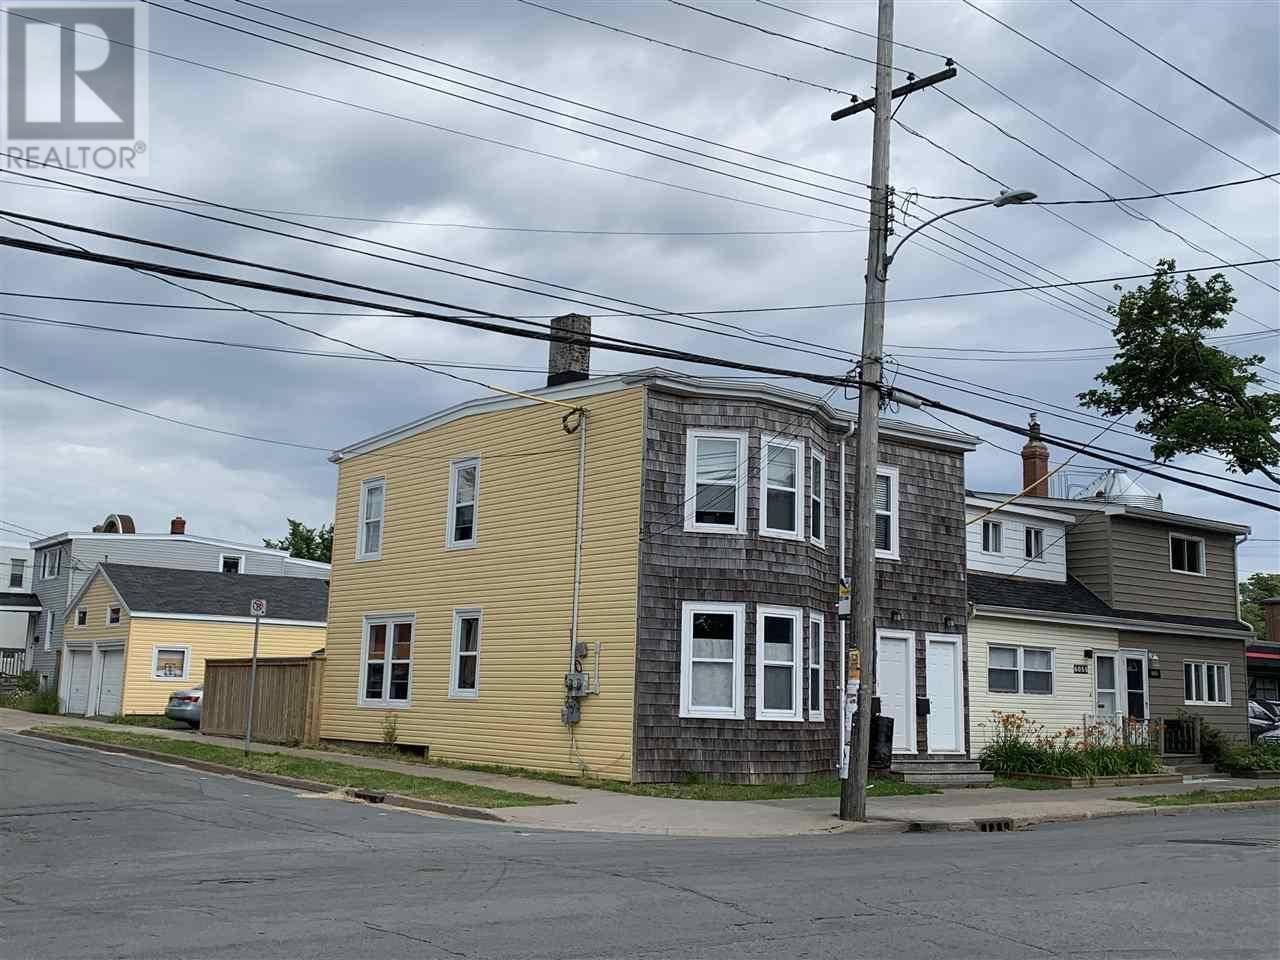 Townhouse for sale at 6059 North St Unit 6057 Halifax Nova Scotia - MLS: 201921896